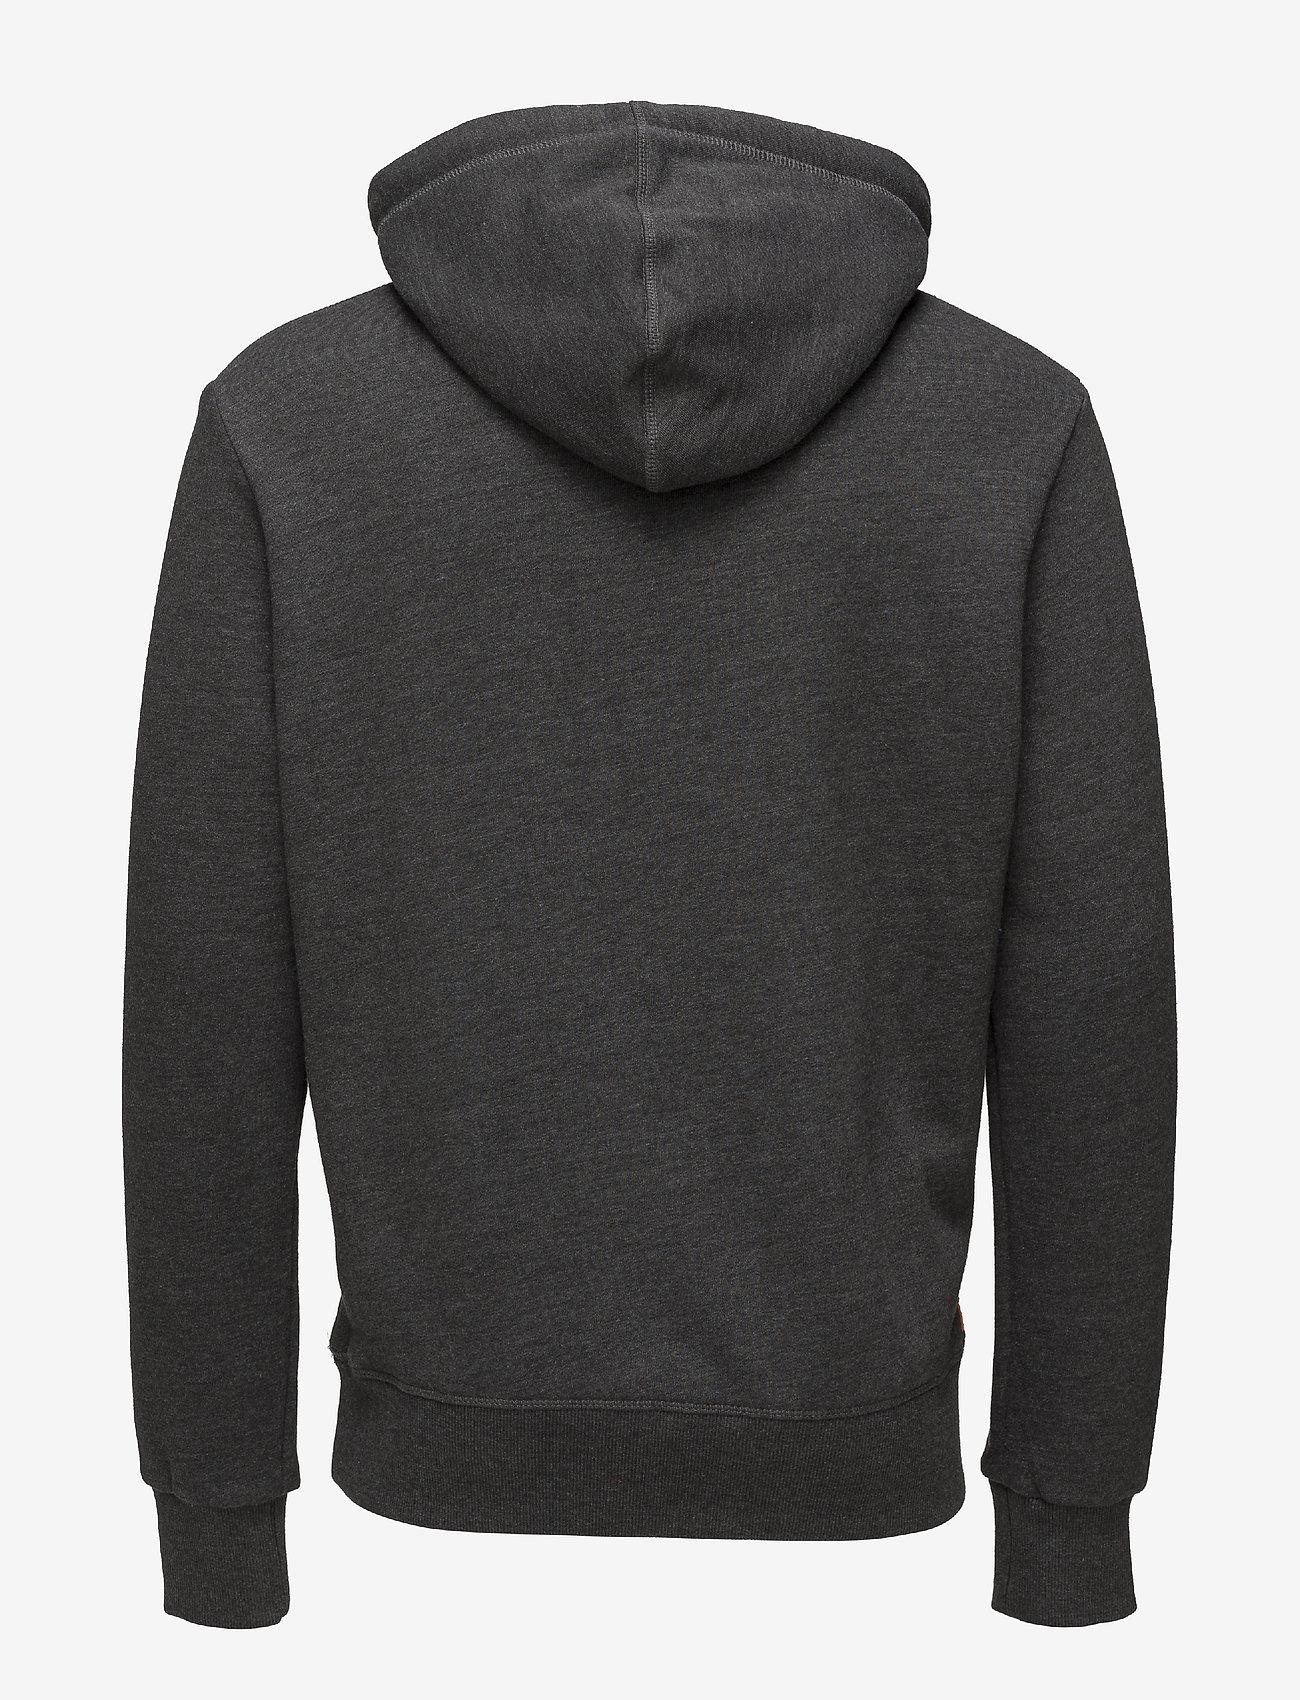 Superdry SWEAT SHIRT SHOP DUO HOOD - Sweatshirts WINTER CHARCOAL MARL - Menn Klær